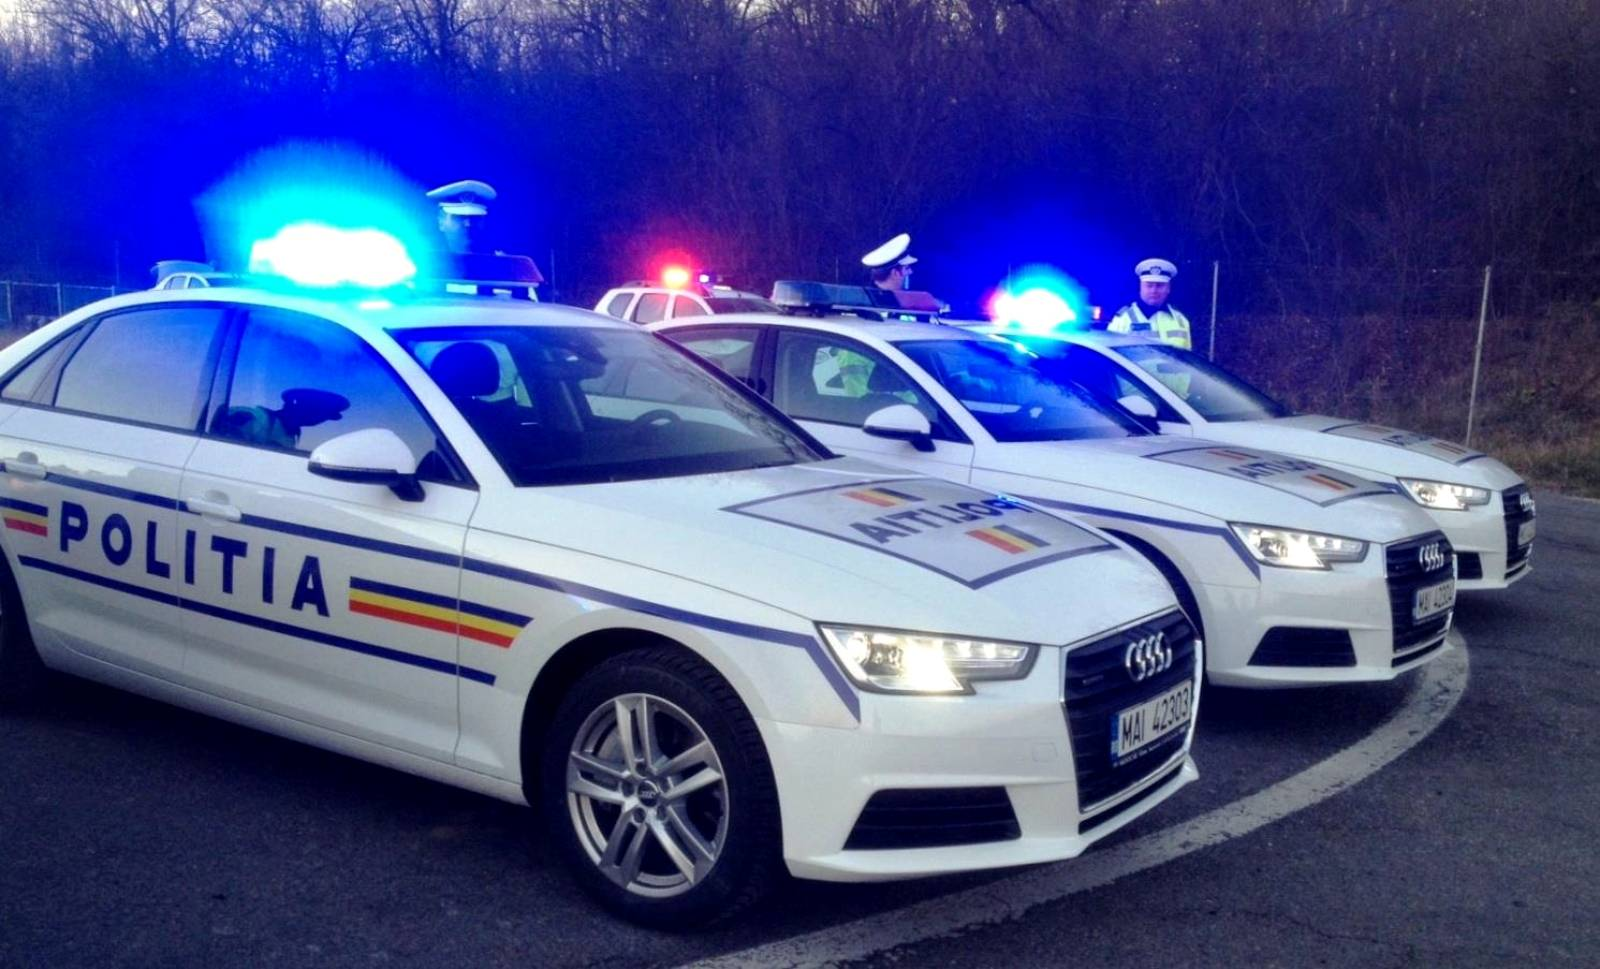 Politia Romana masca suier